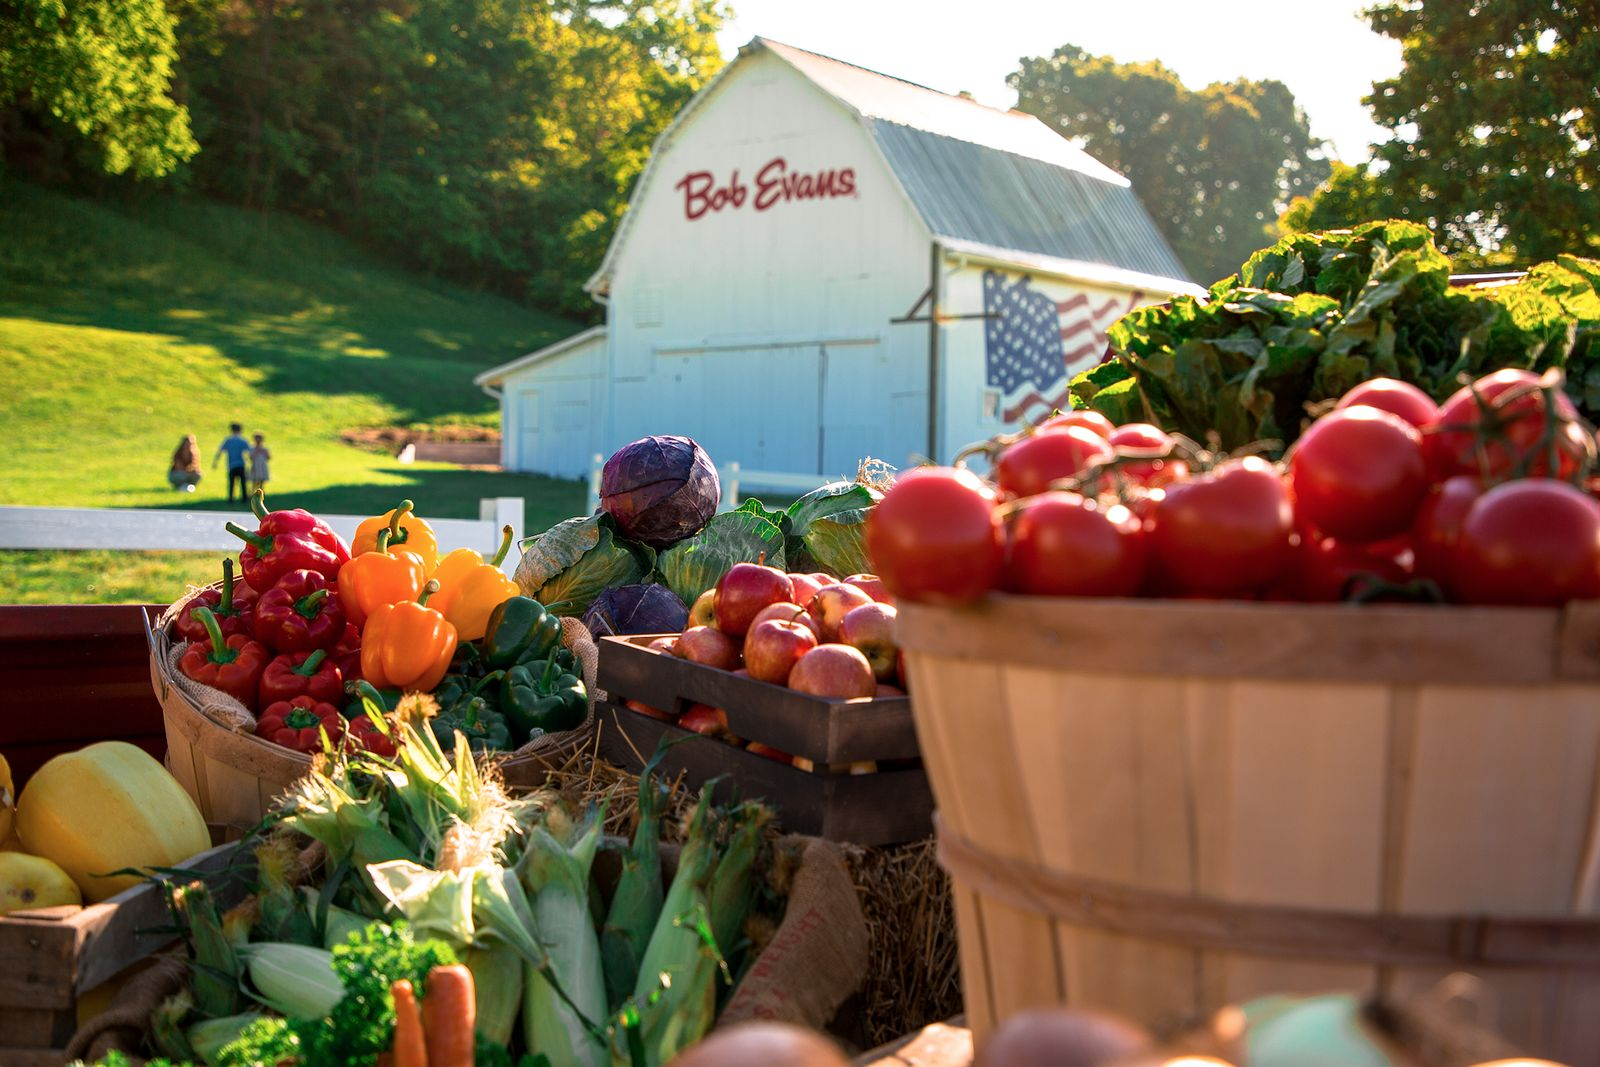 Bob Evans Restaurants Announces Partnership with FFA